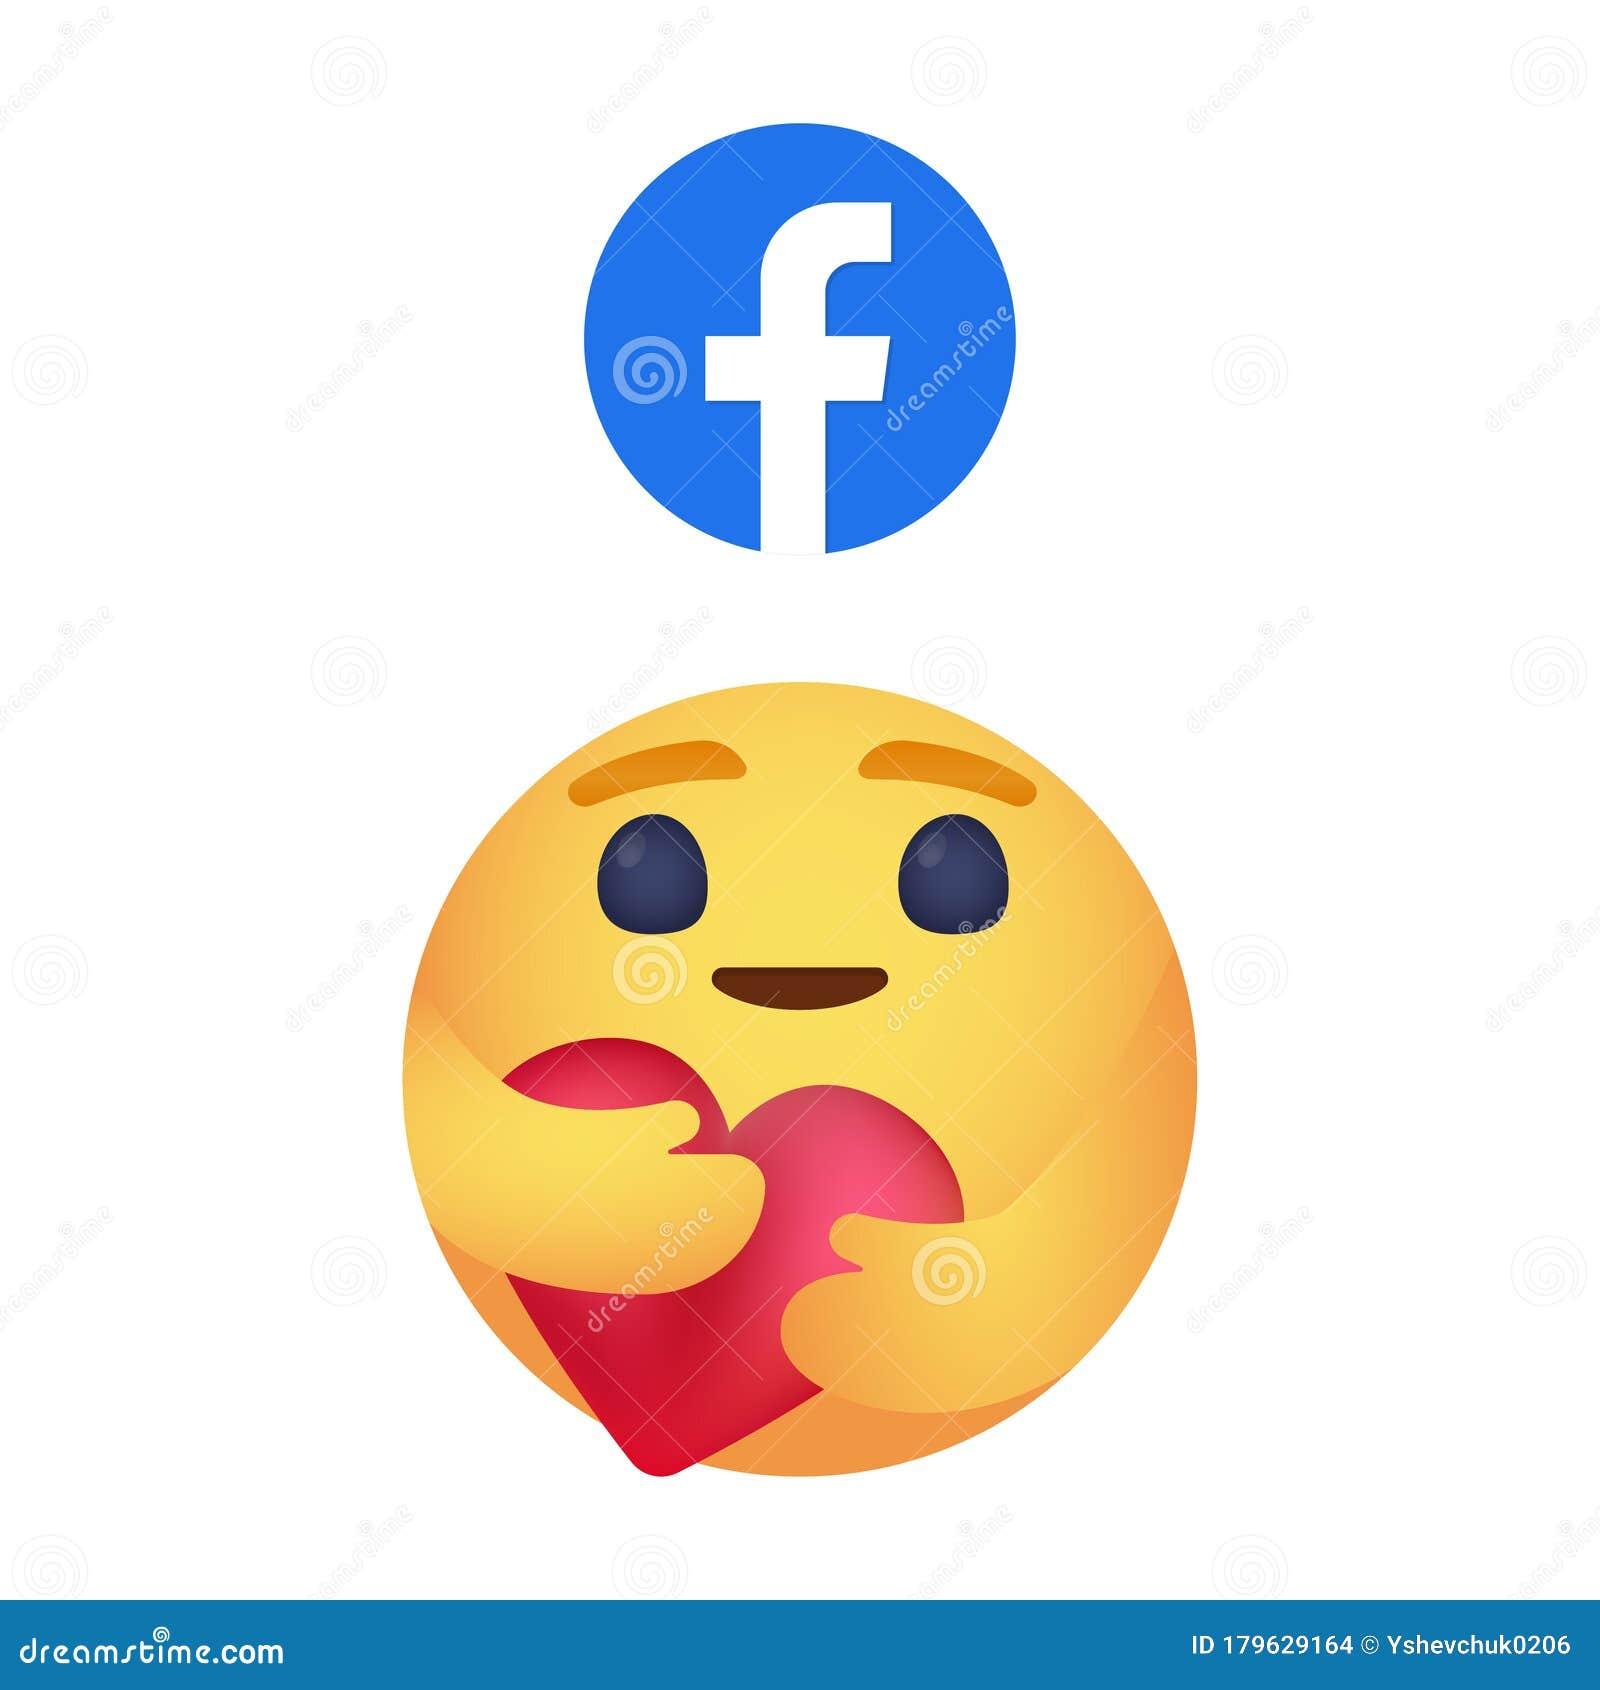 Facebook Emoticon Button Care Emoji Reaction For Social Network Kyiv Ukraine April 18 2020 Editorial Stock Image Illustration Of Facebook Emoji 179629164